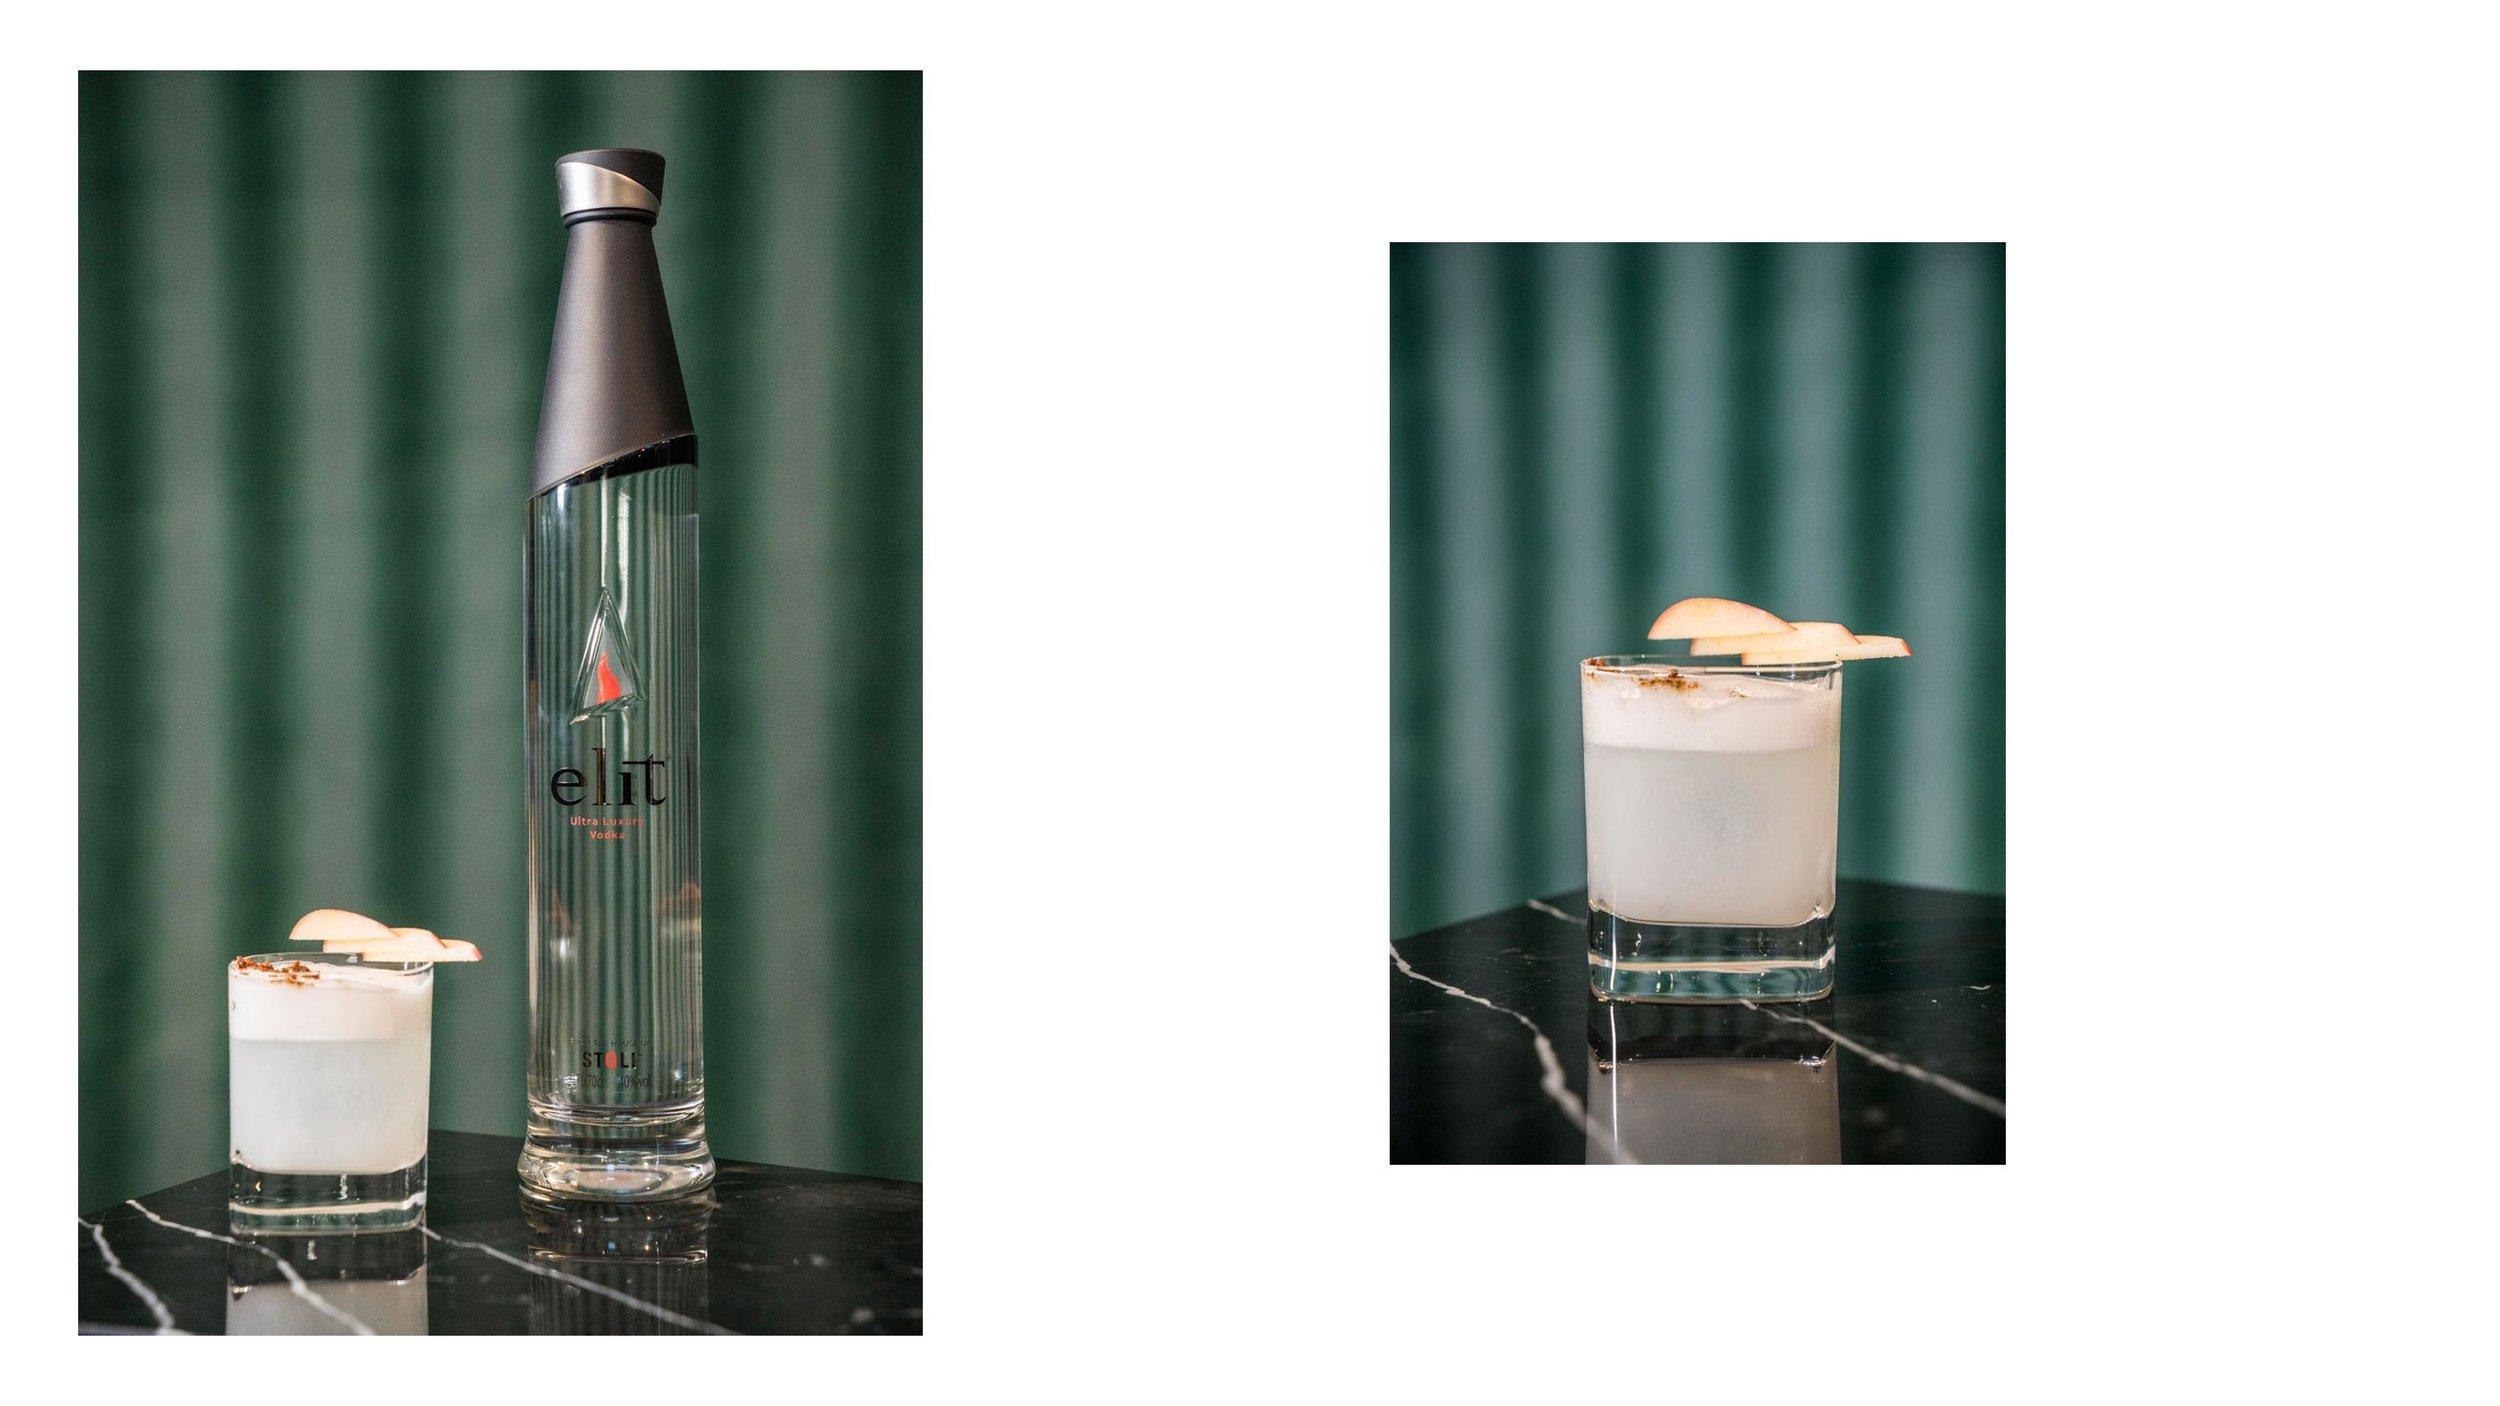 object_elit_vodka_inspired_by_el_lissitzky.jpg